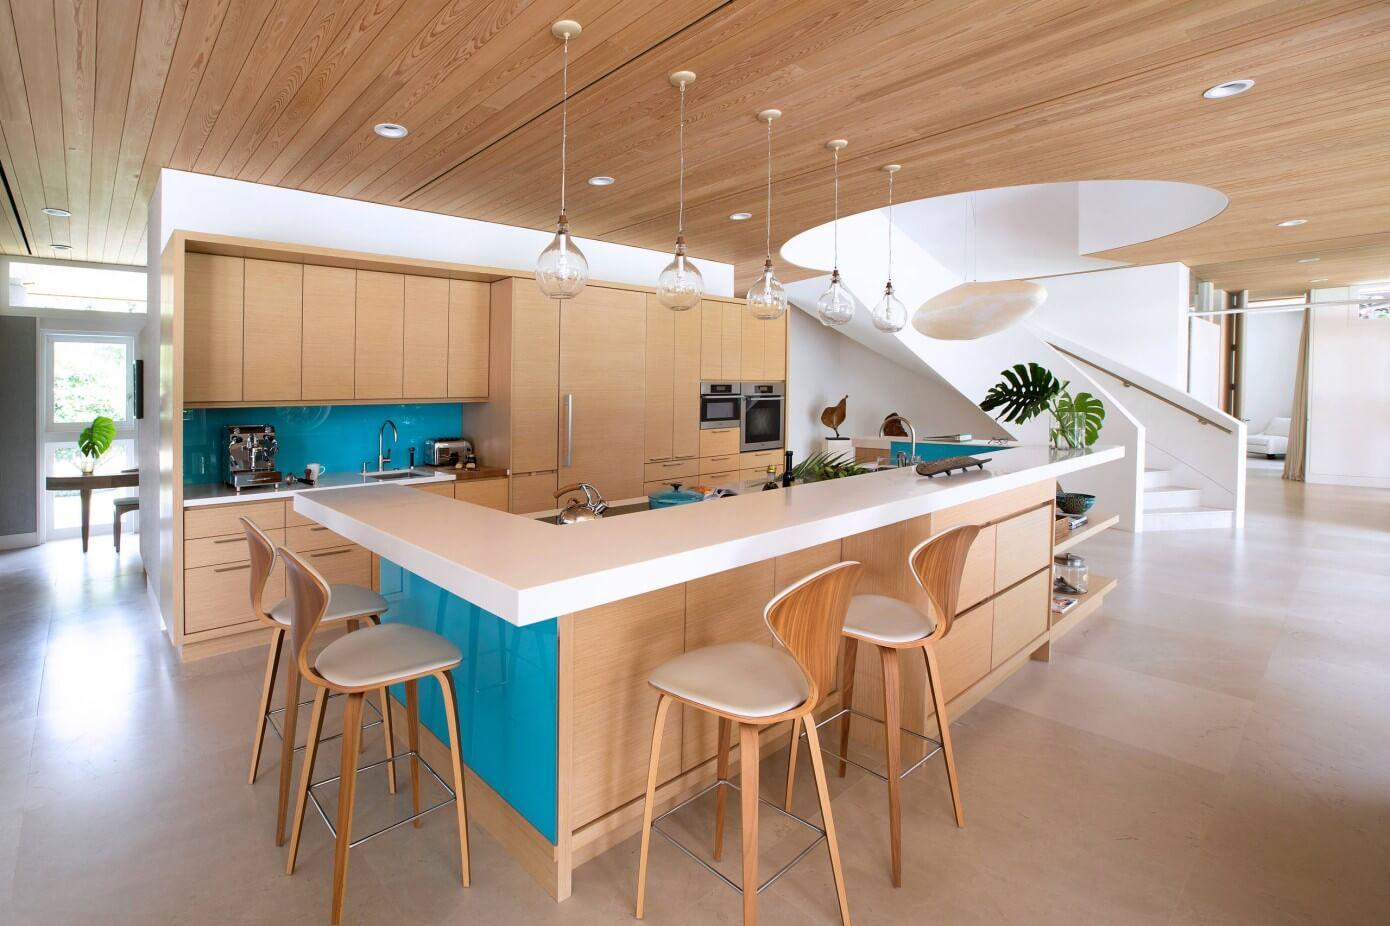 013 jupiter island home voce di id homeadore. Black Bedroom Furniture Sets. Home Design Ideas